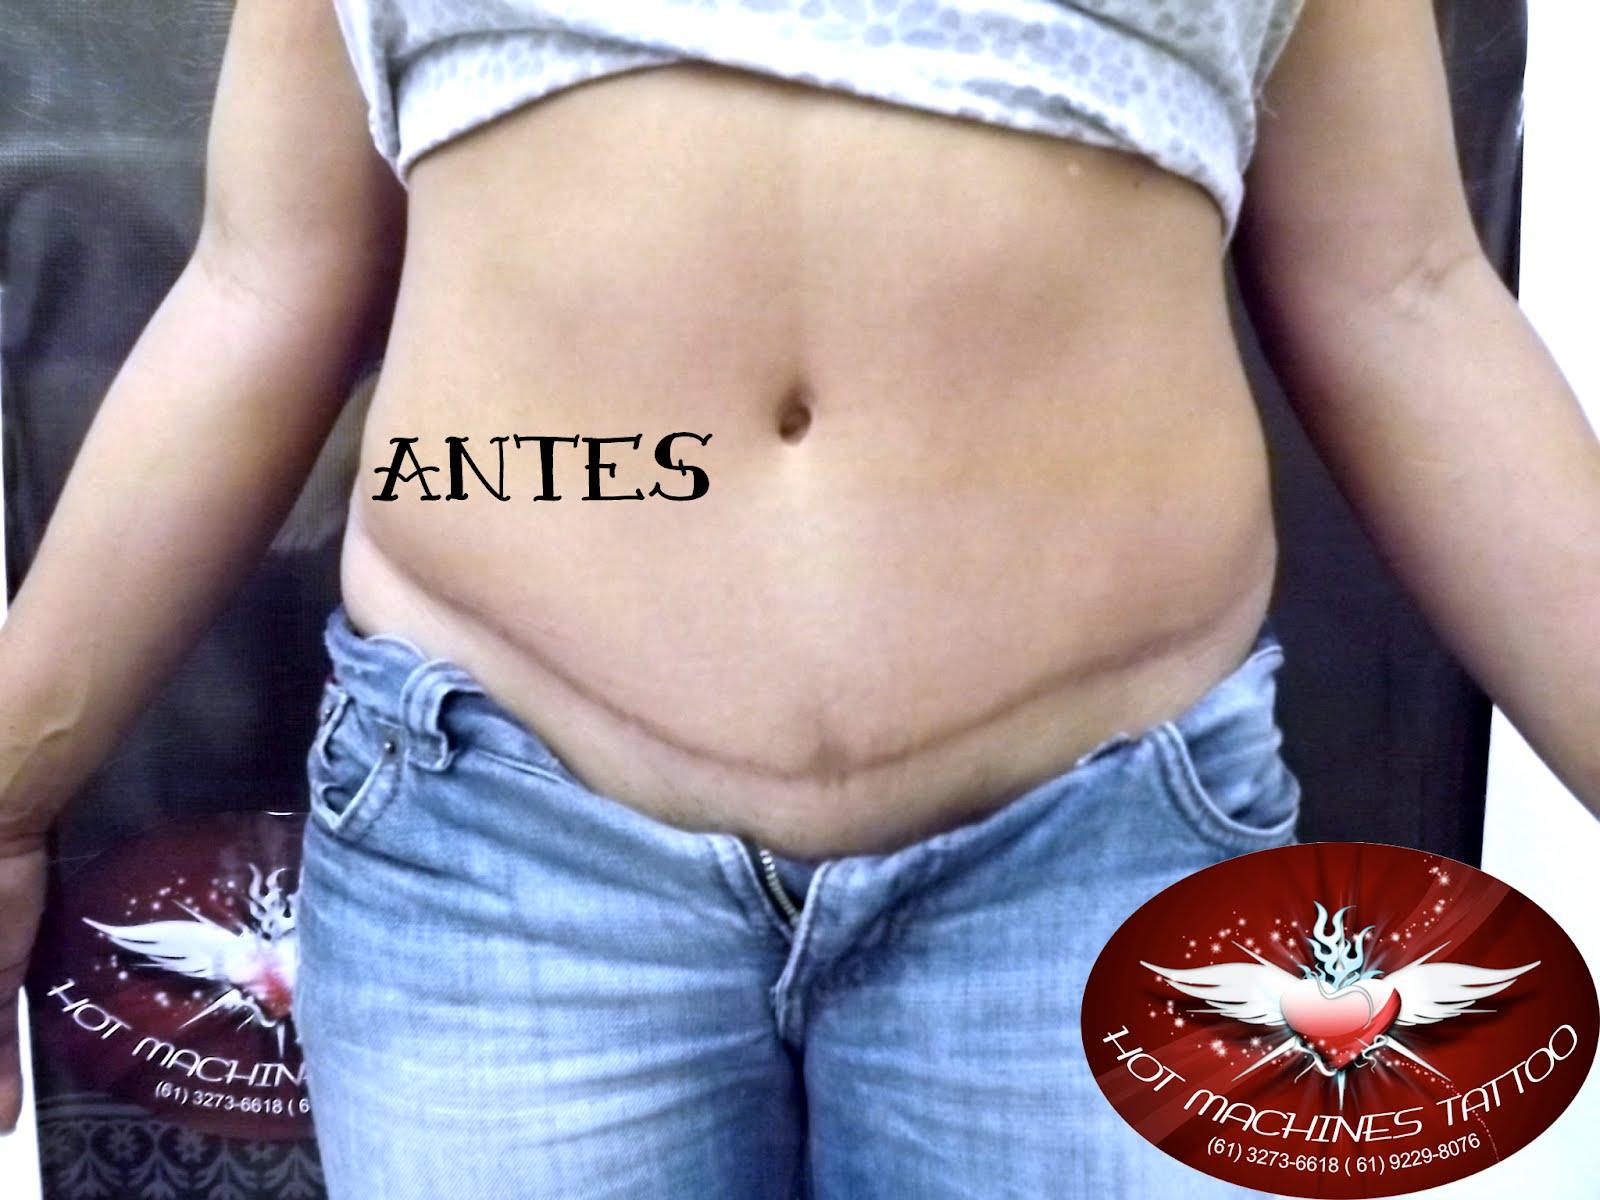 Tattoo Cobertura De Cicatriz De Abdominoplastia